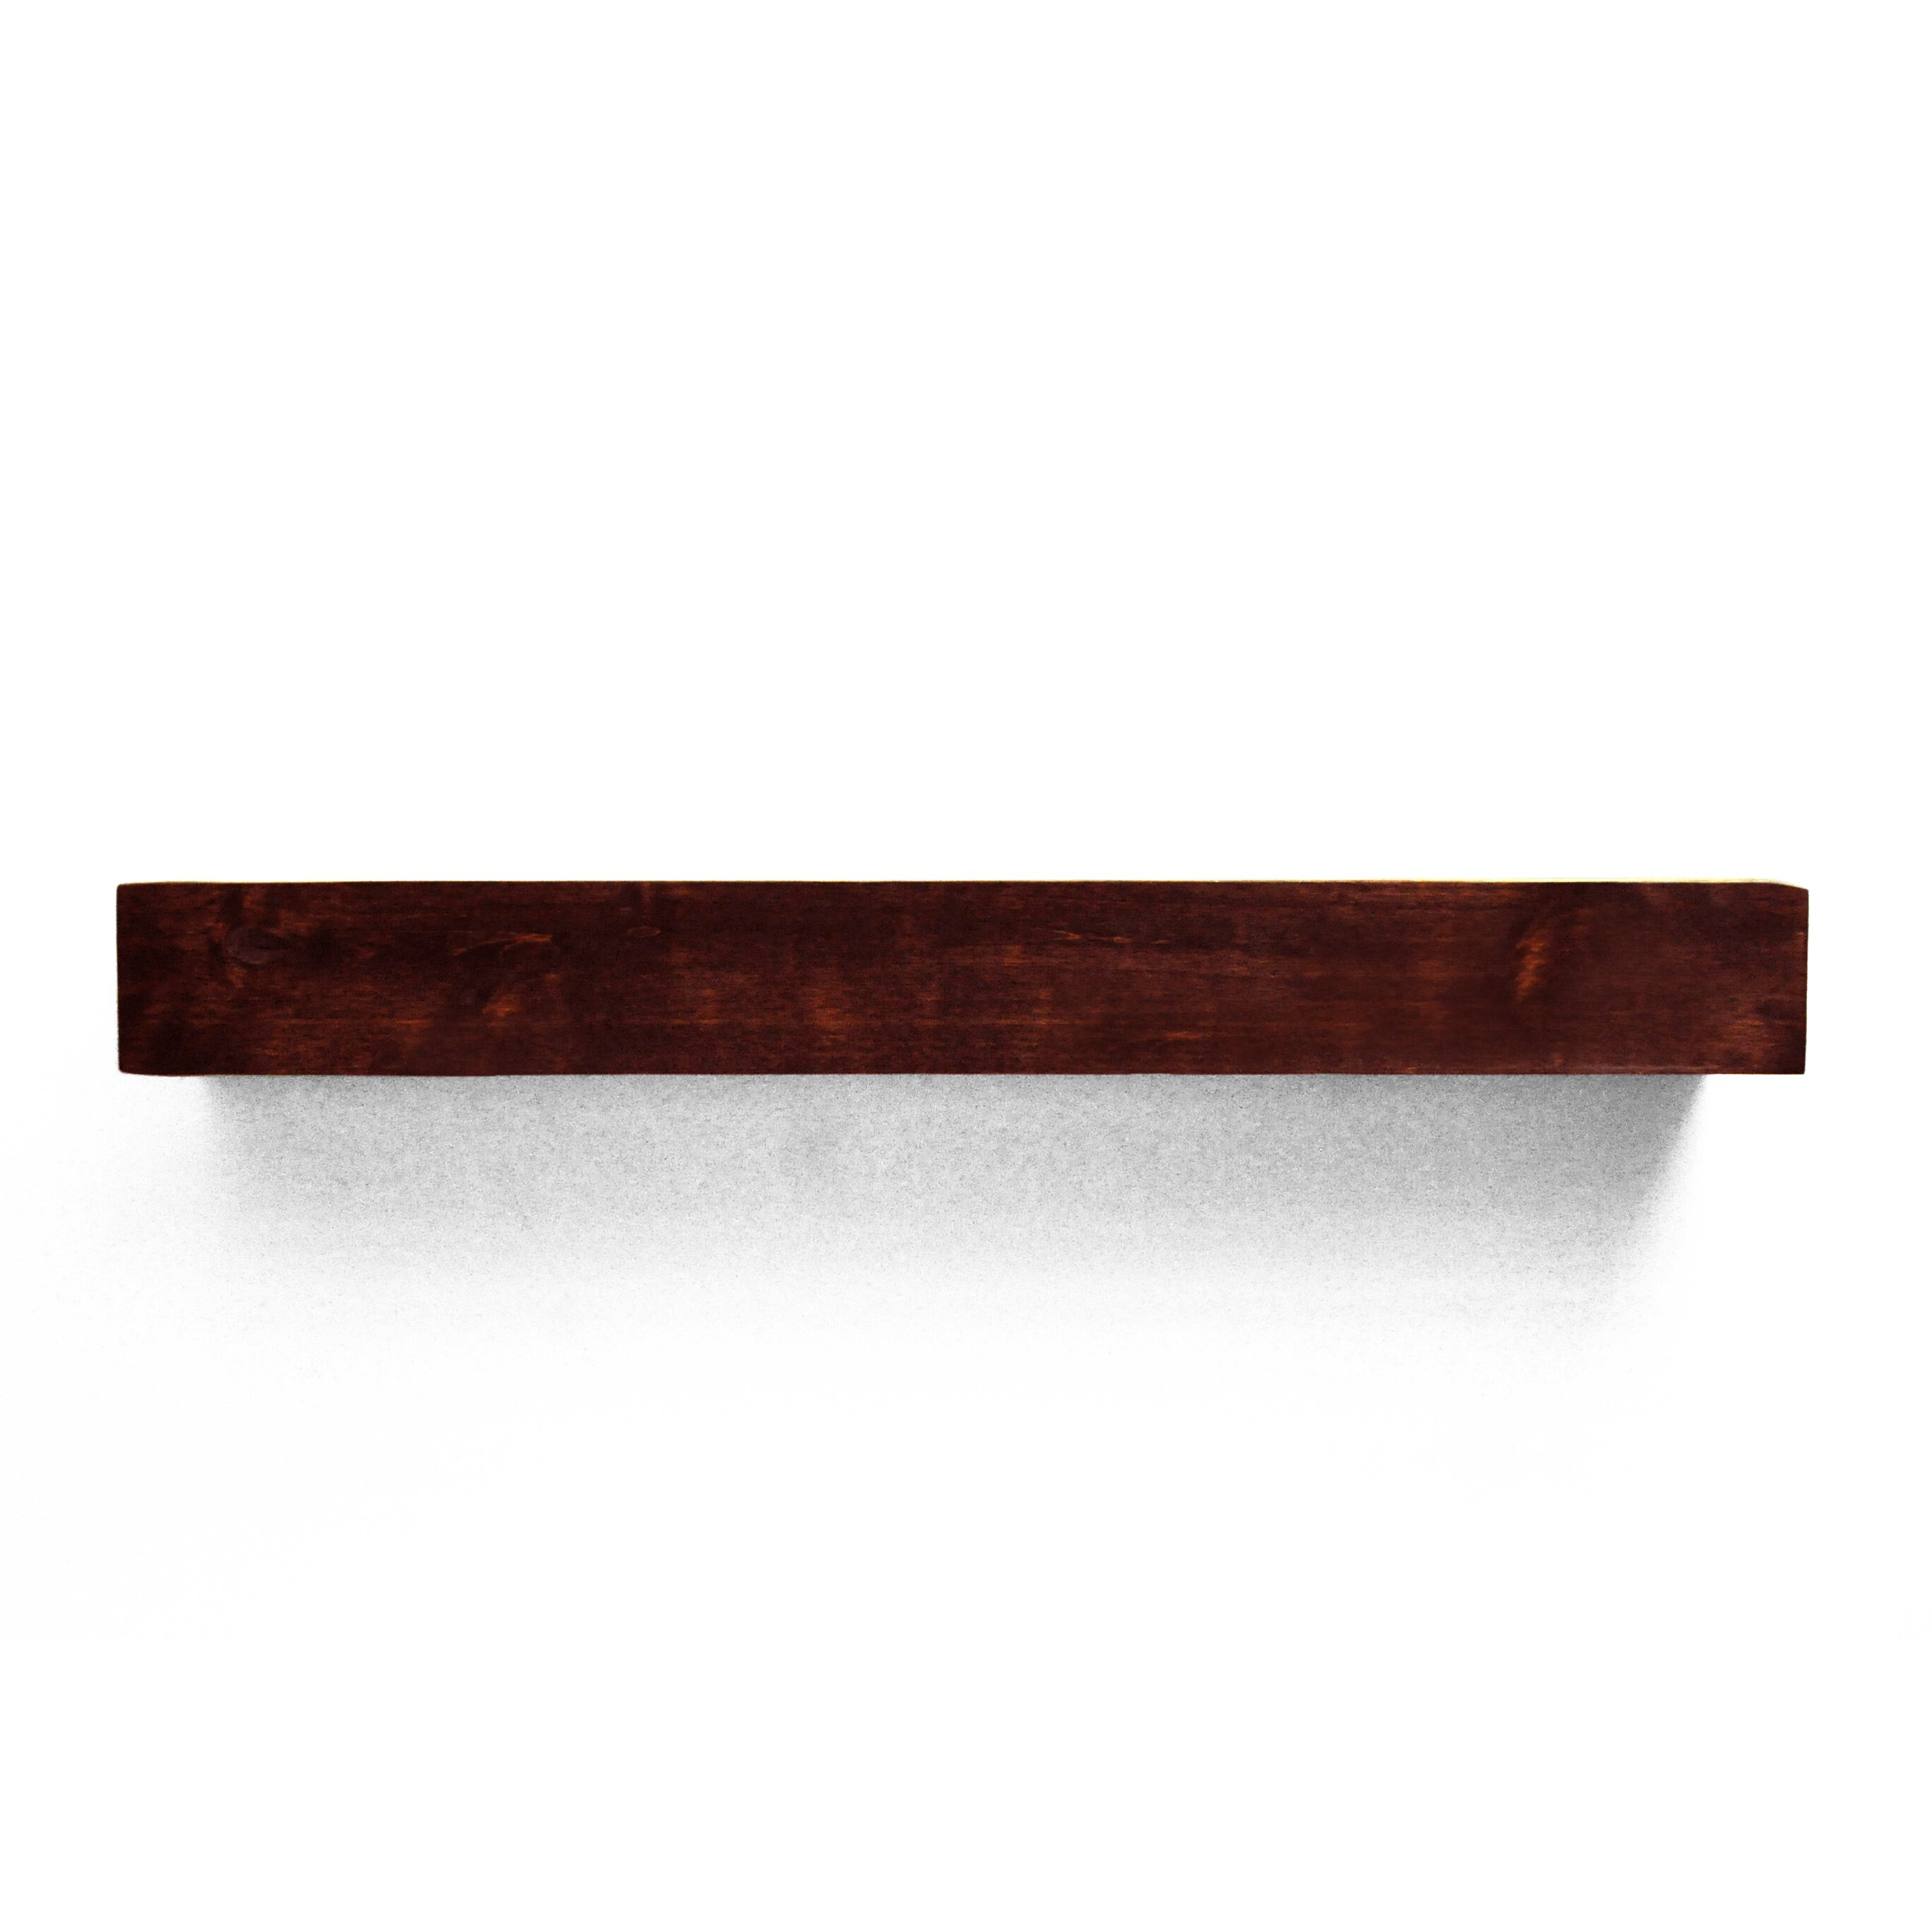 Dogberry Collections Modern Farmhouse Fireplace Mantel Shelf Reviews Wayfair